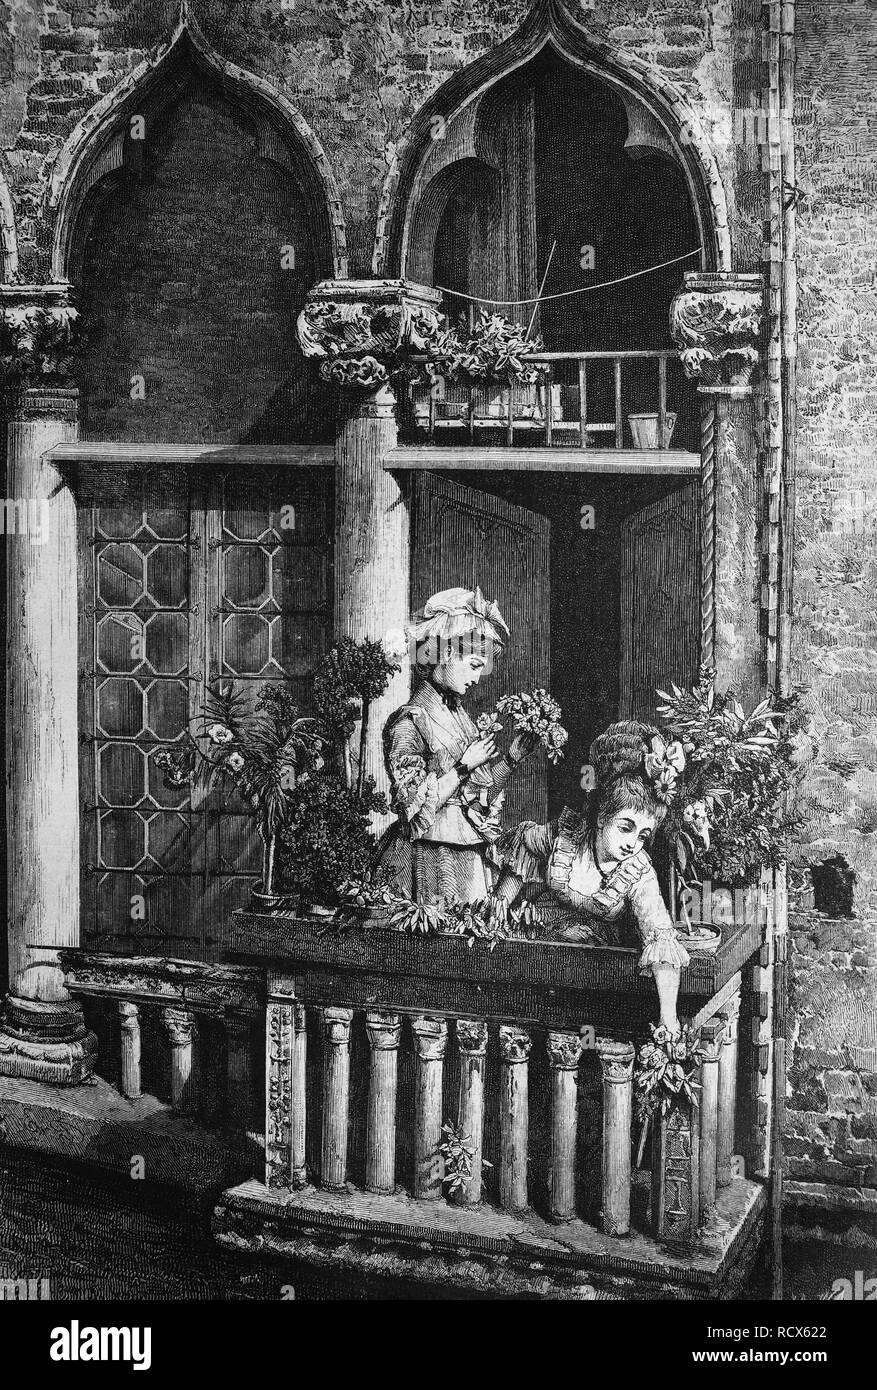 Venetian balcony, Italy, wood engraving, c 1880 - Stock Image